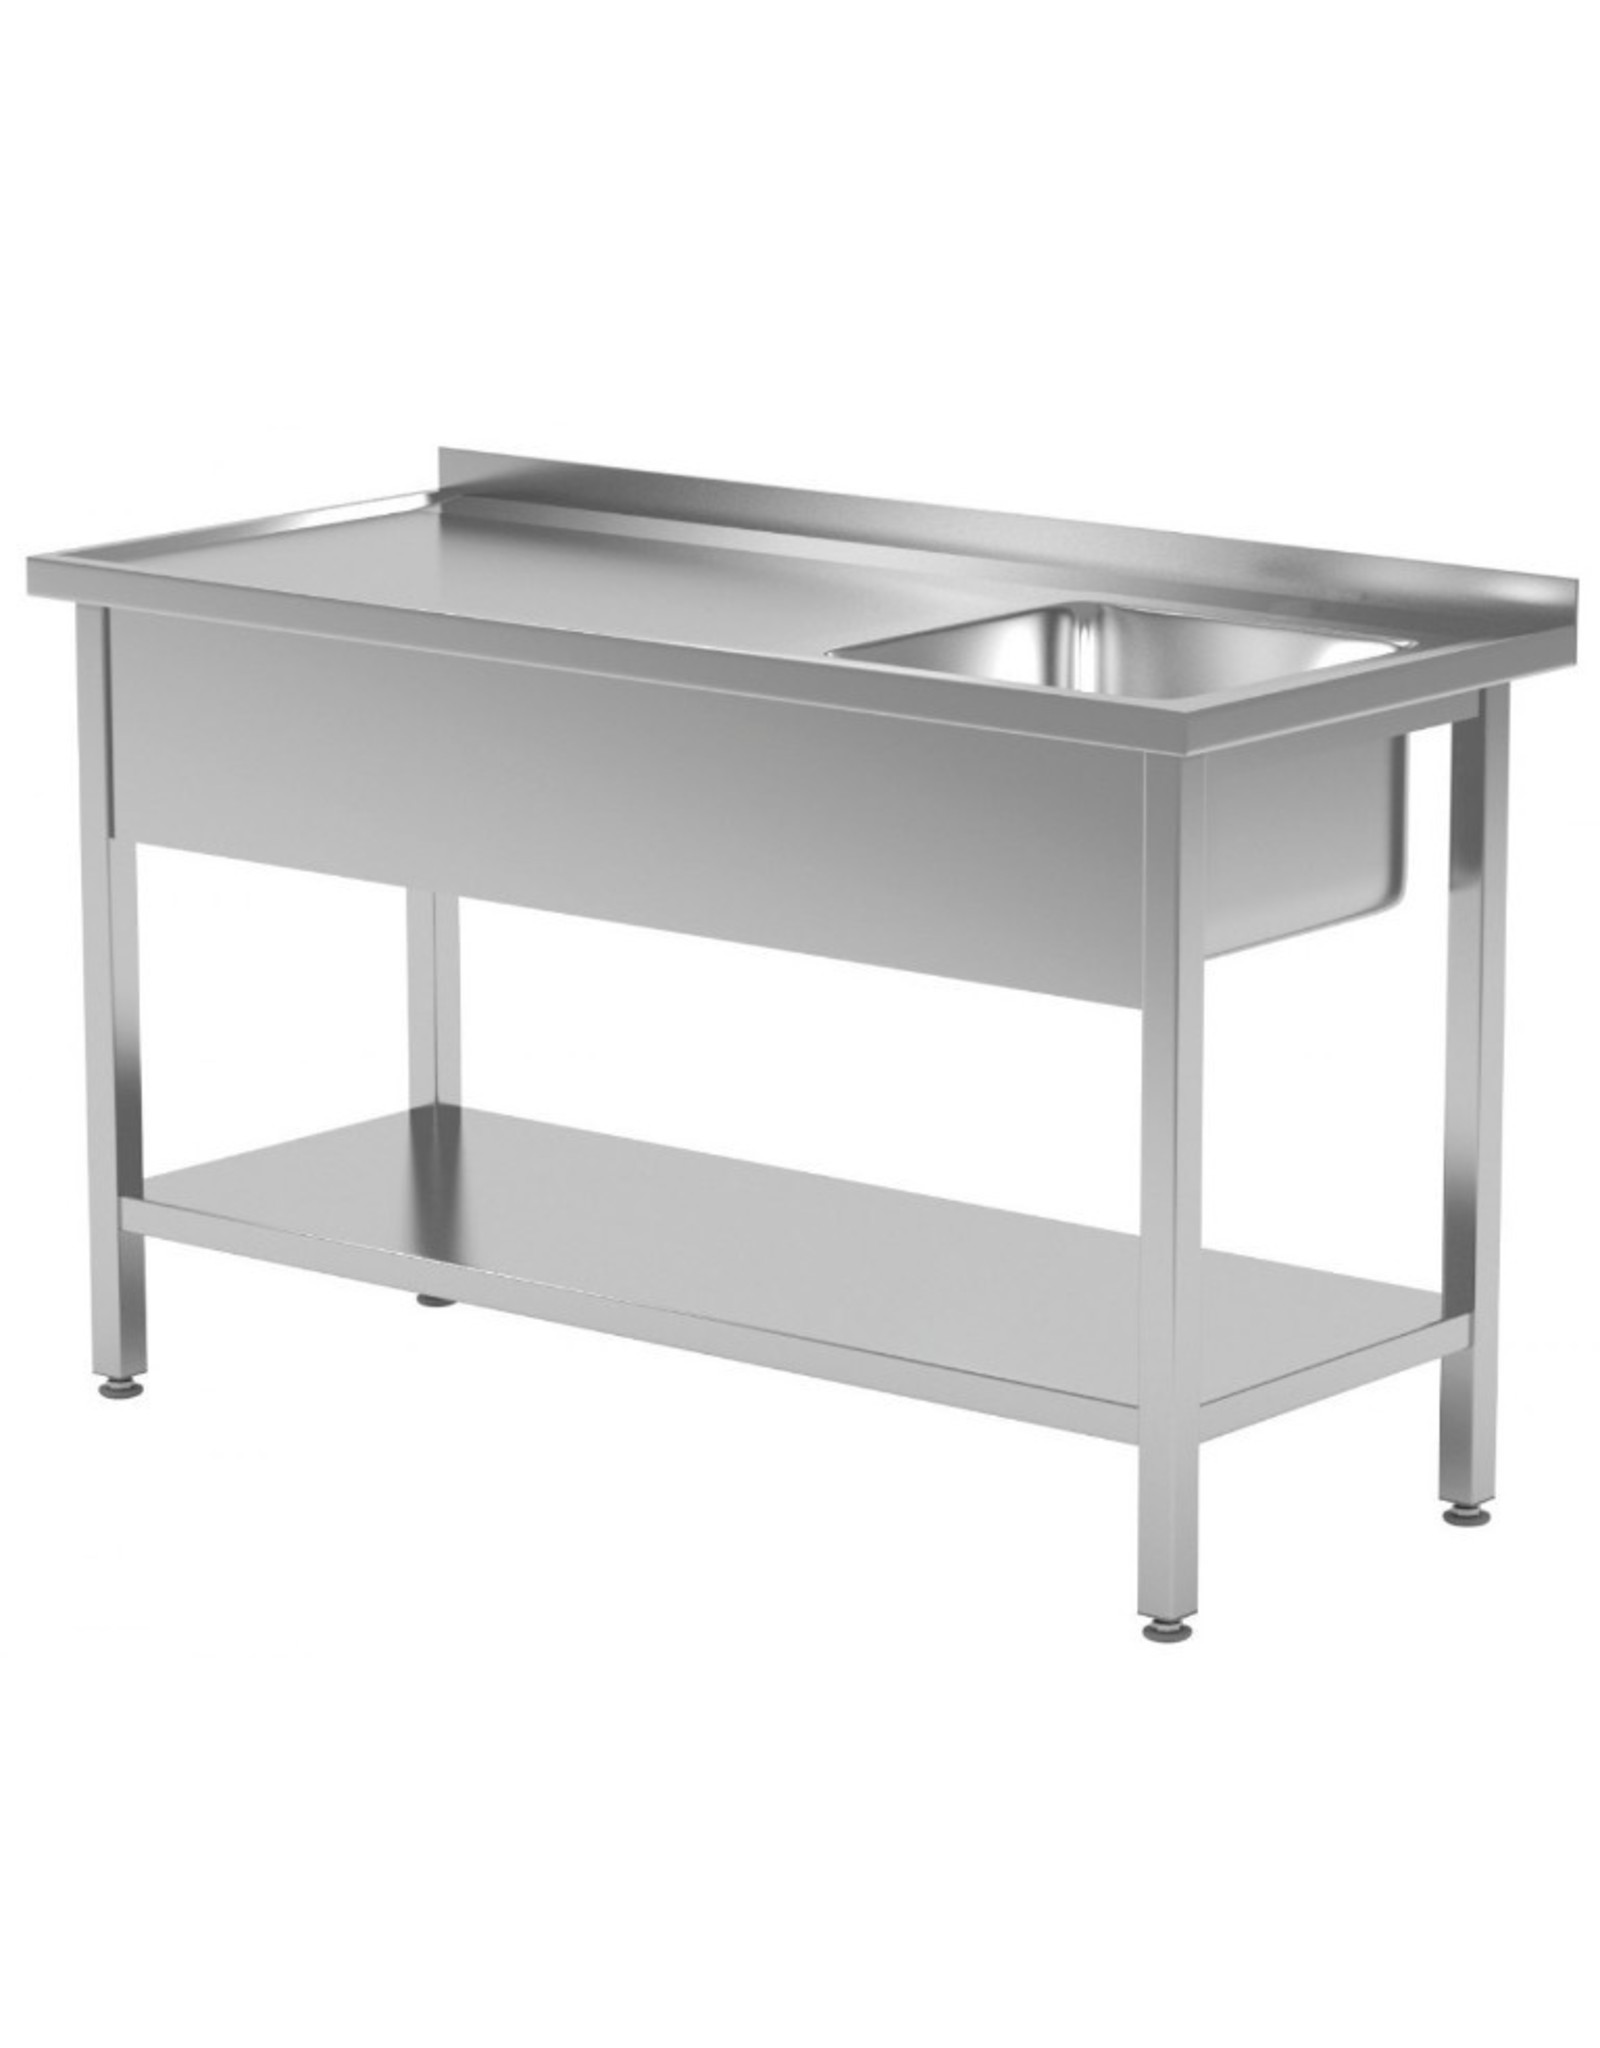 Spoeltafel | met onderplank | spoelbak rechts | 800-1900mm breed | 600 of 700mm diep